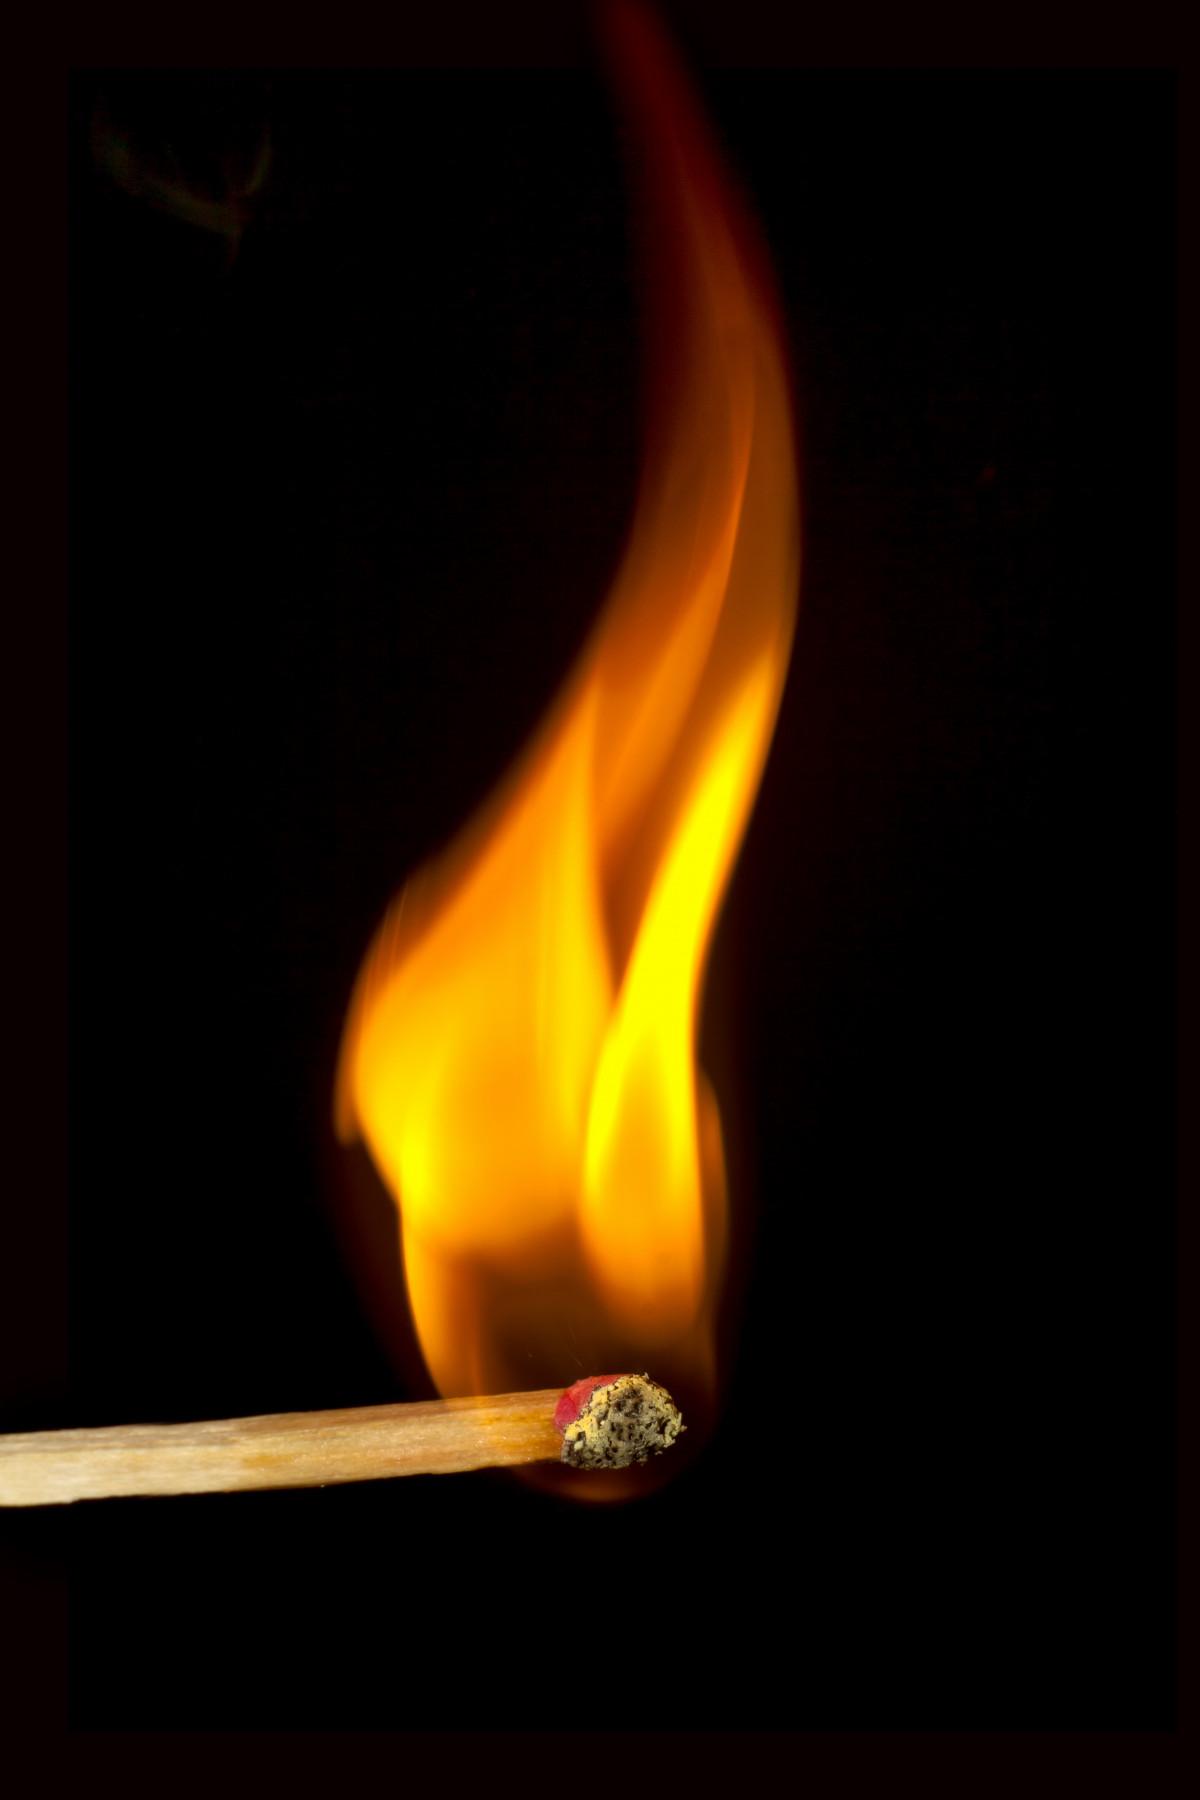 Kostenlose foto : Rauch, entzünden, rot, Farbe, Makro, Flamme, Feuer ...